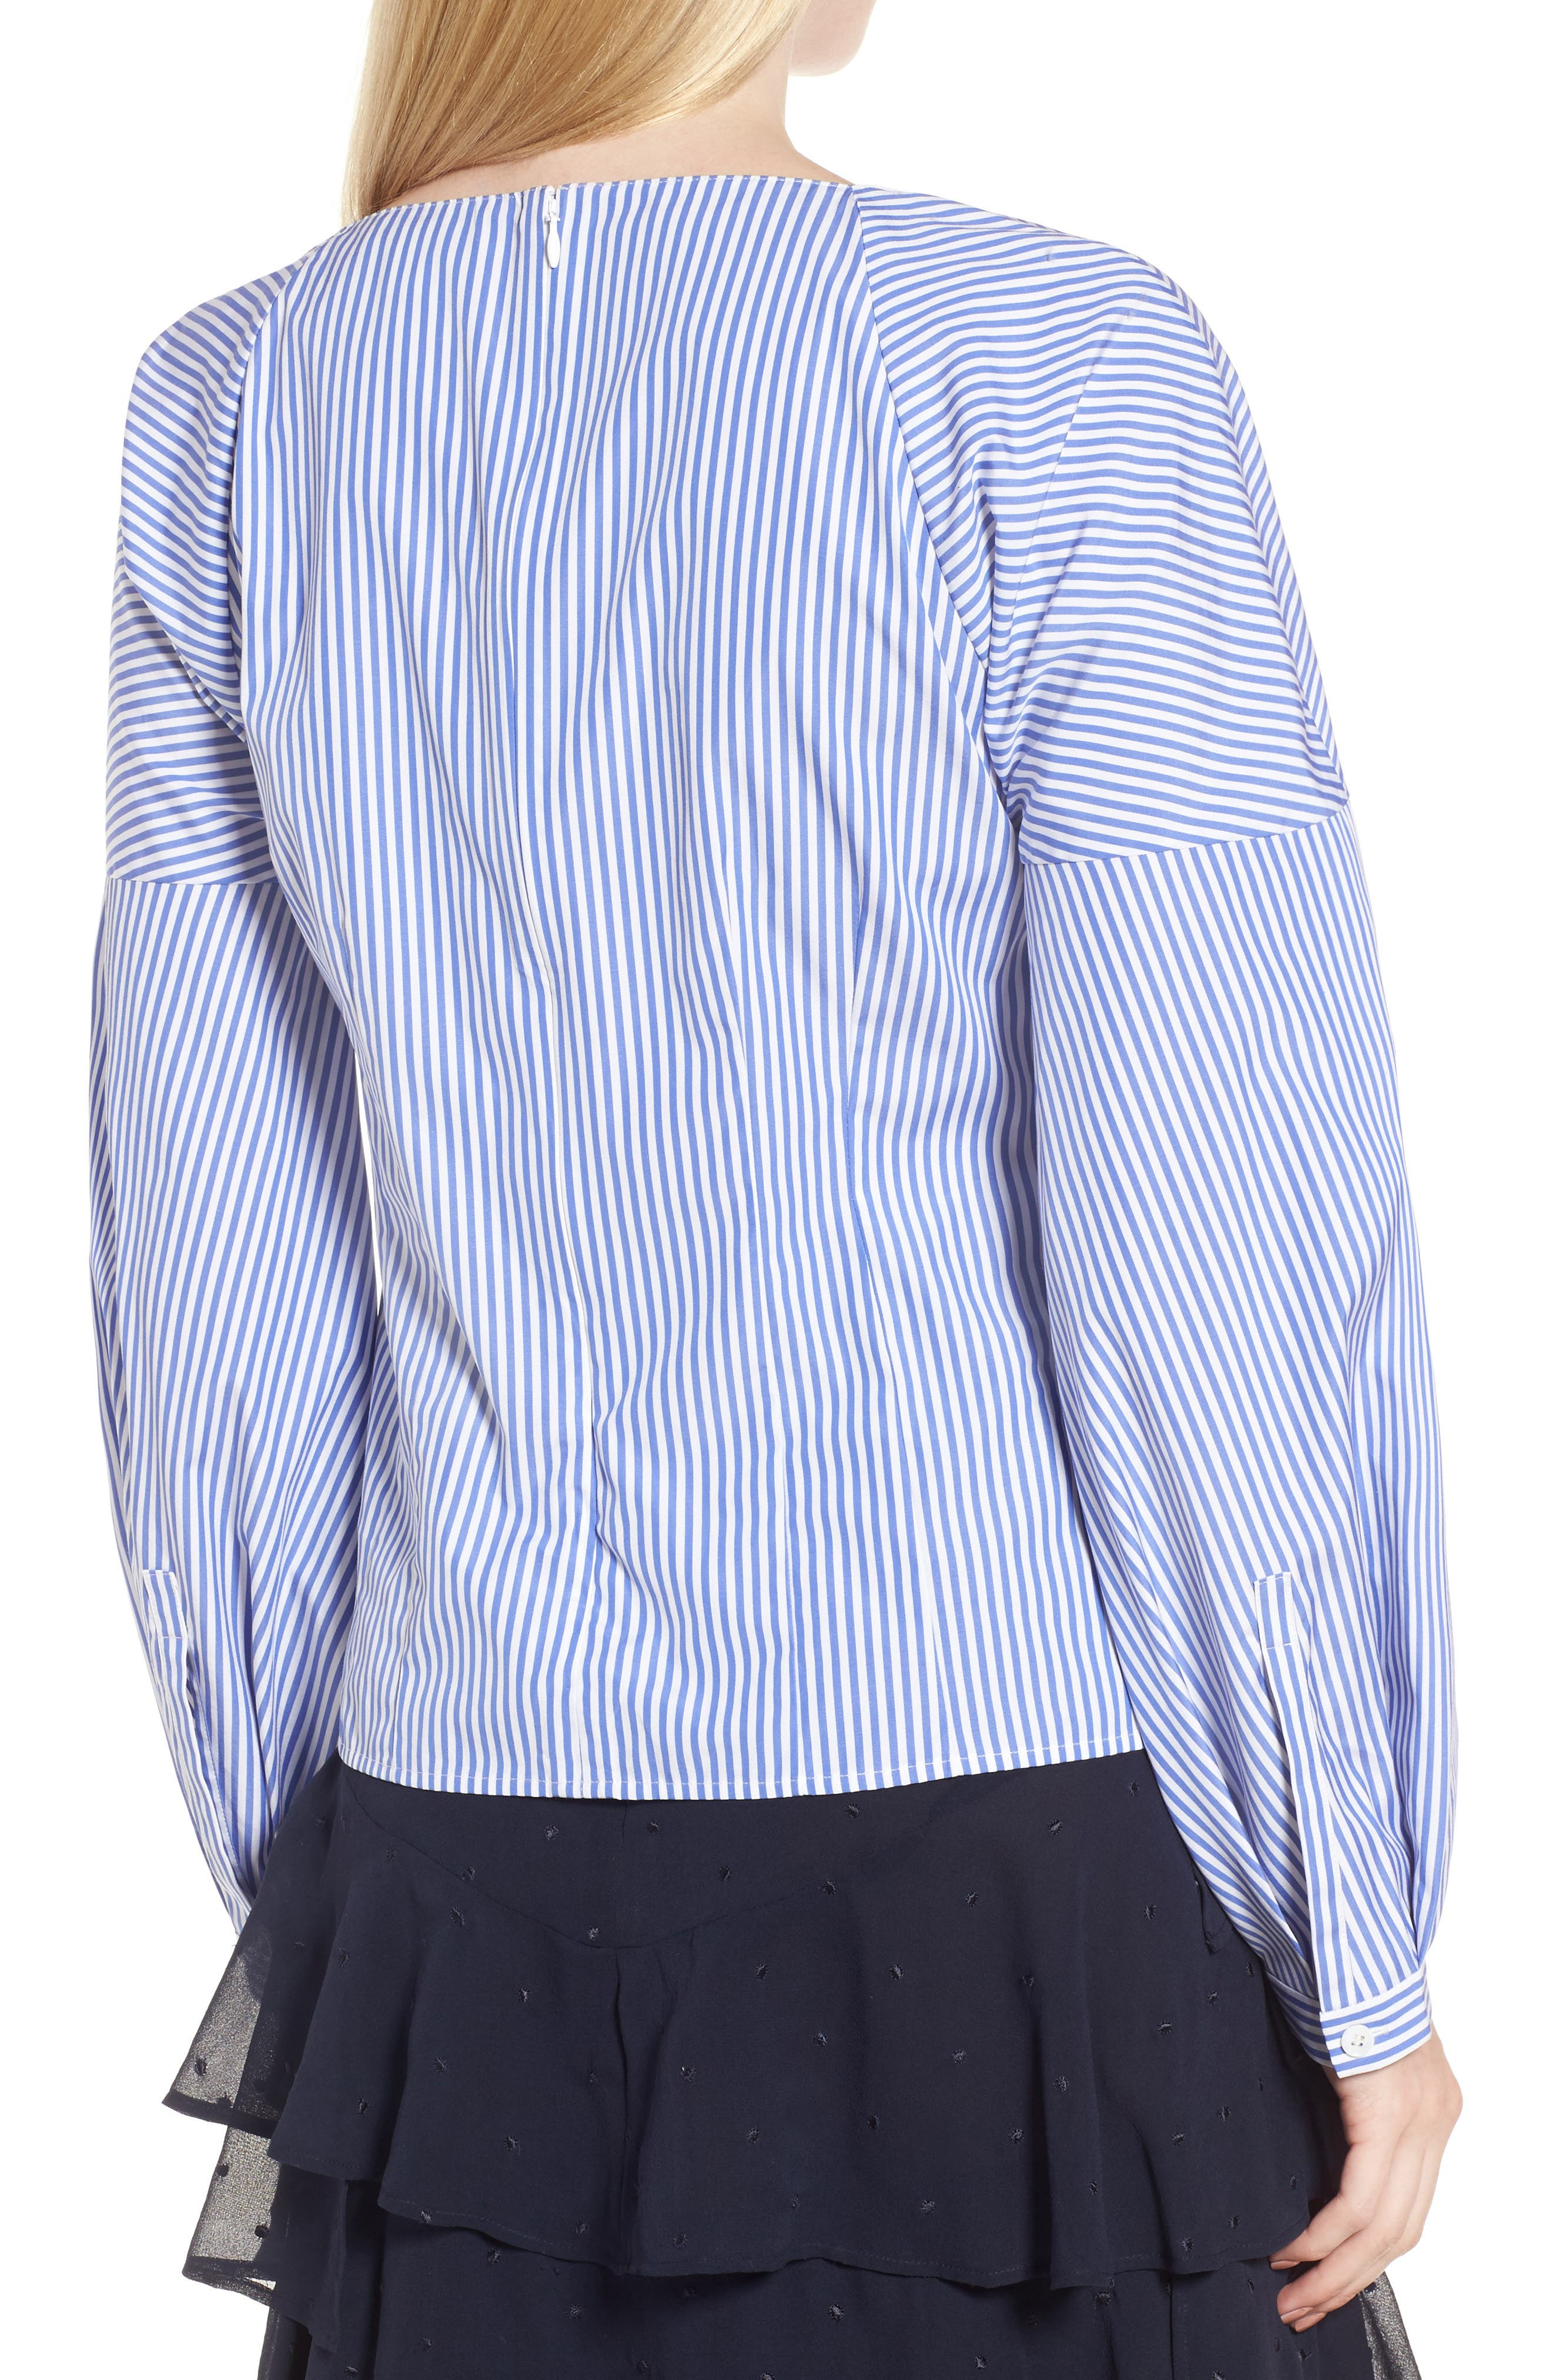 Balloon Sleeve Stripe Shirt,                             Alternate thumbnail 2, color,                             Blue Azurite Vania Stripe